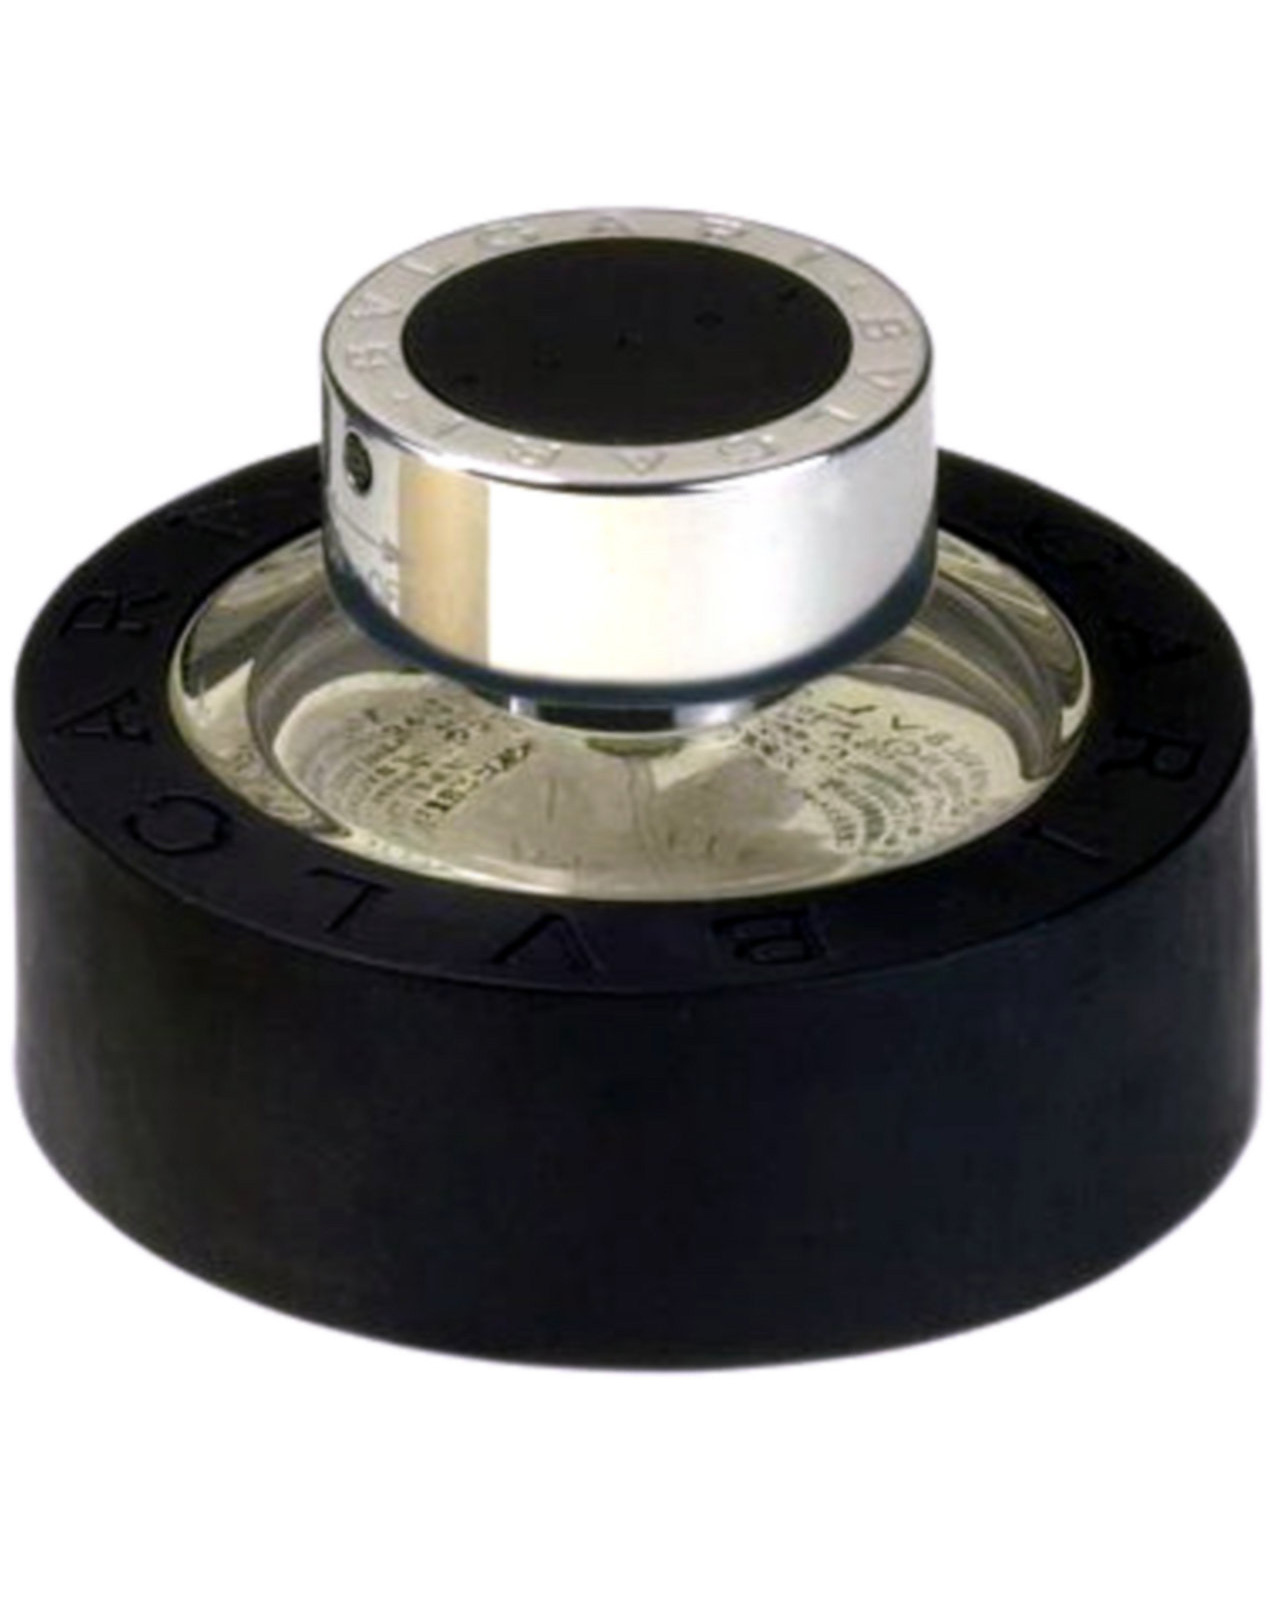 Bvlgari Black туалетная вода 75мл (Булгари Черный)